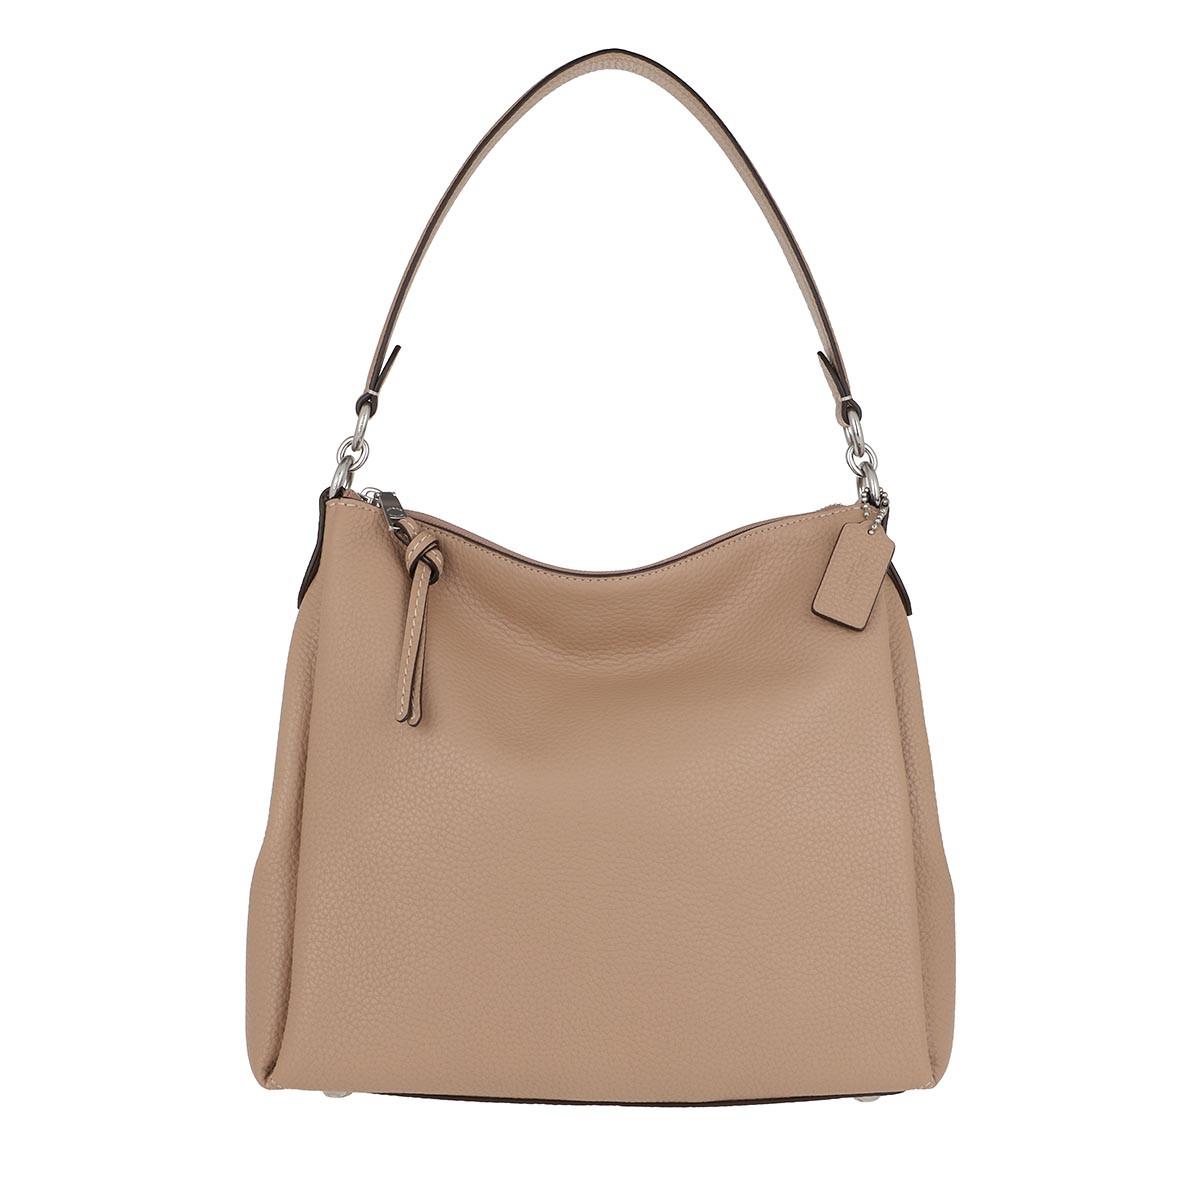 Coach Hobo Bag - Shoulder Bag Taupe - in braun - für Damen